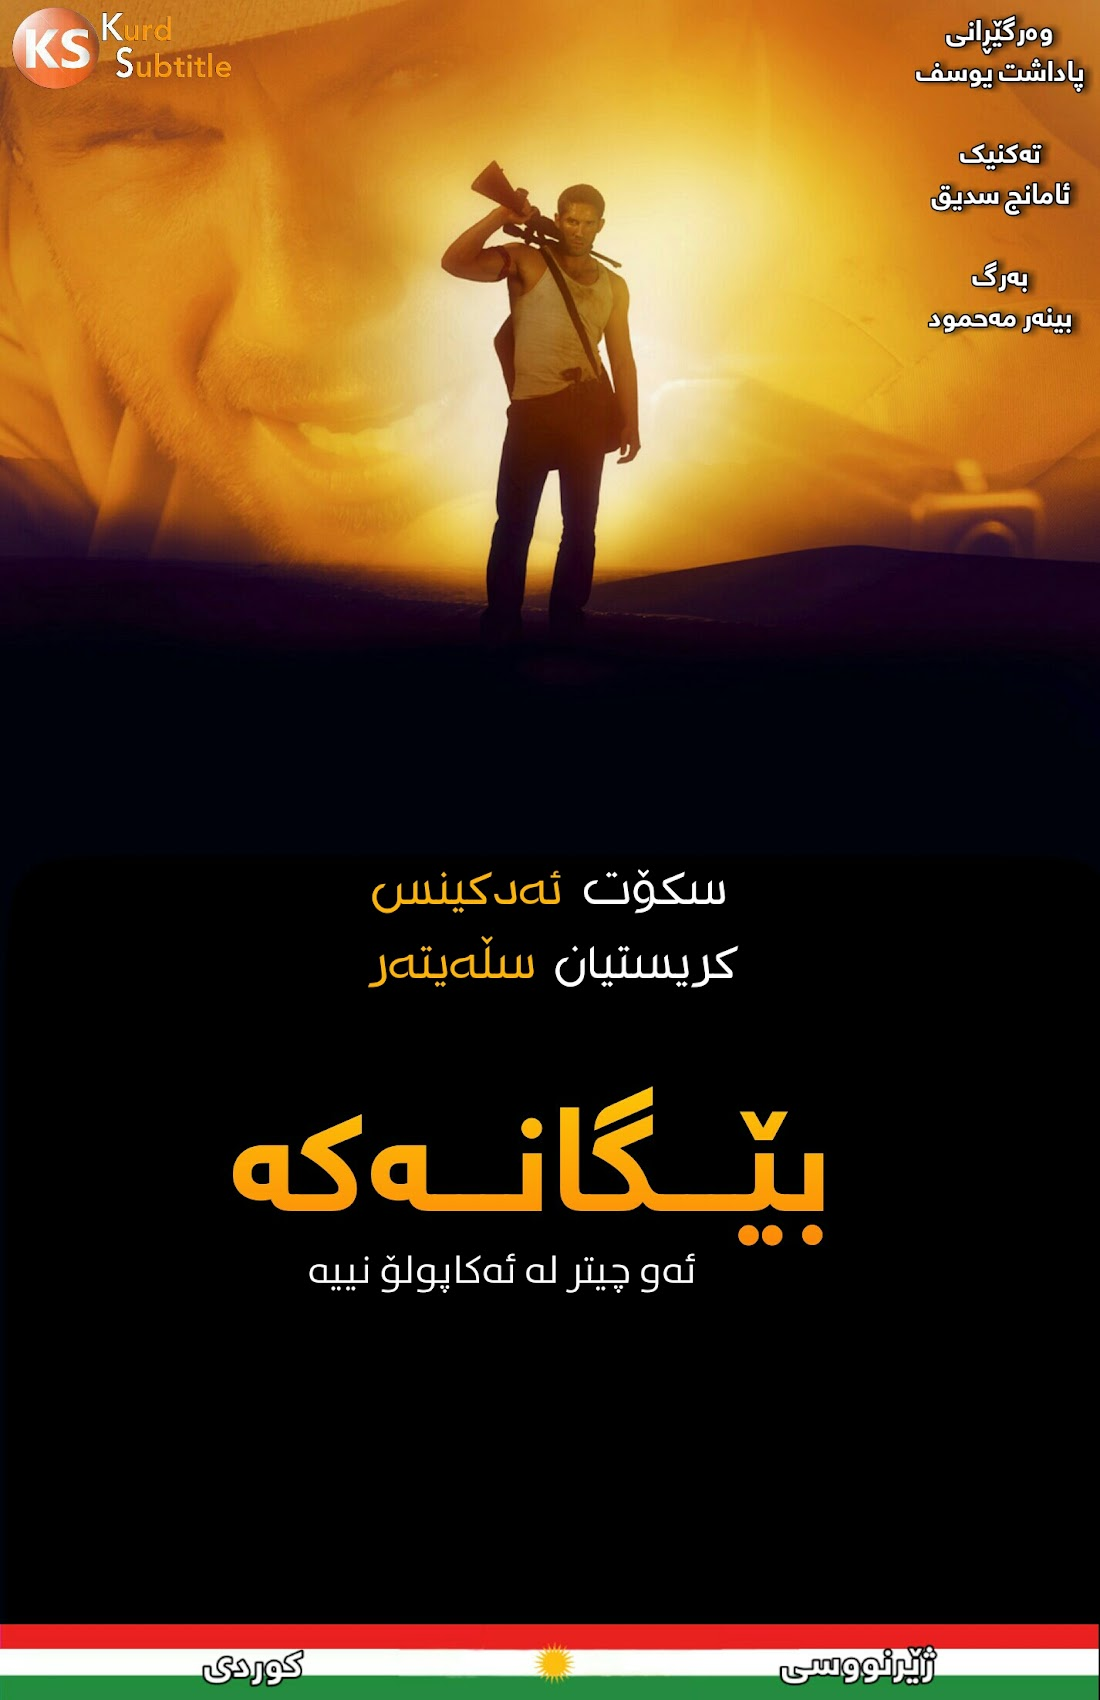 El Gringo kurdish poster